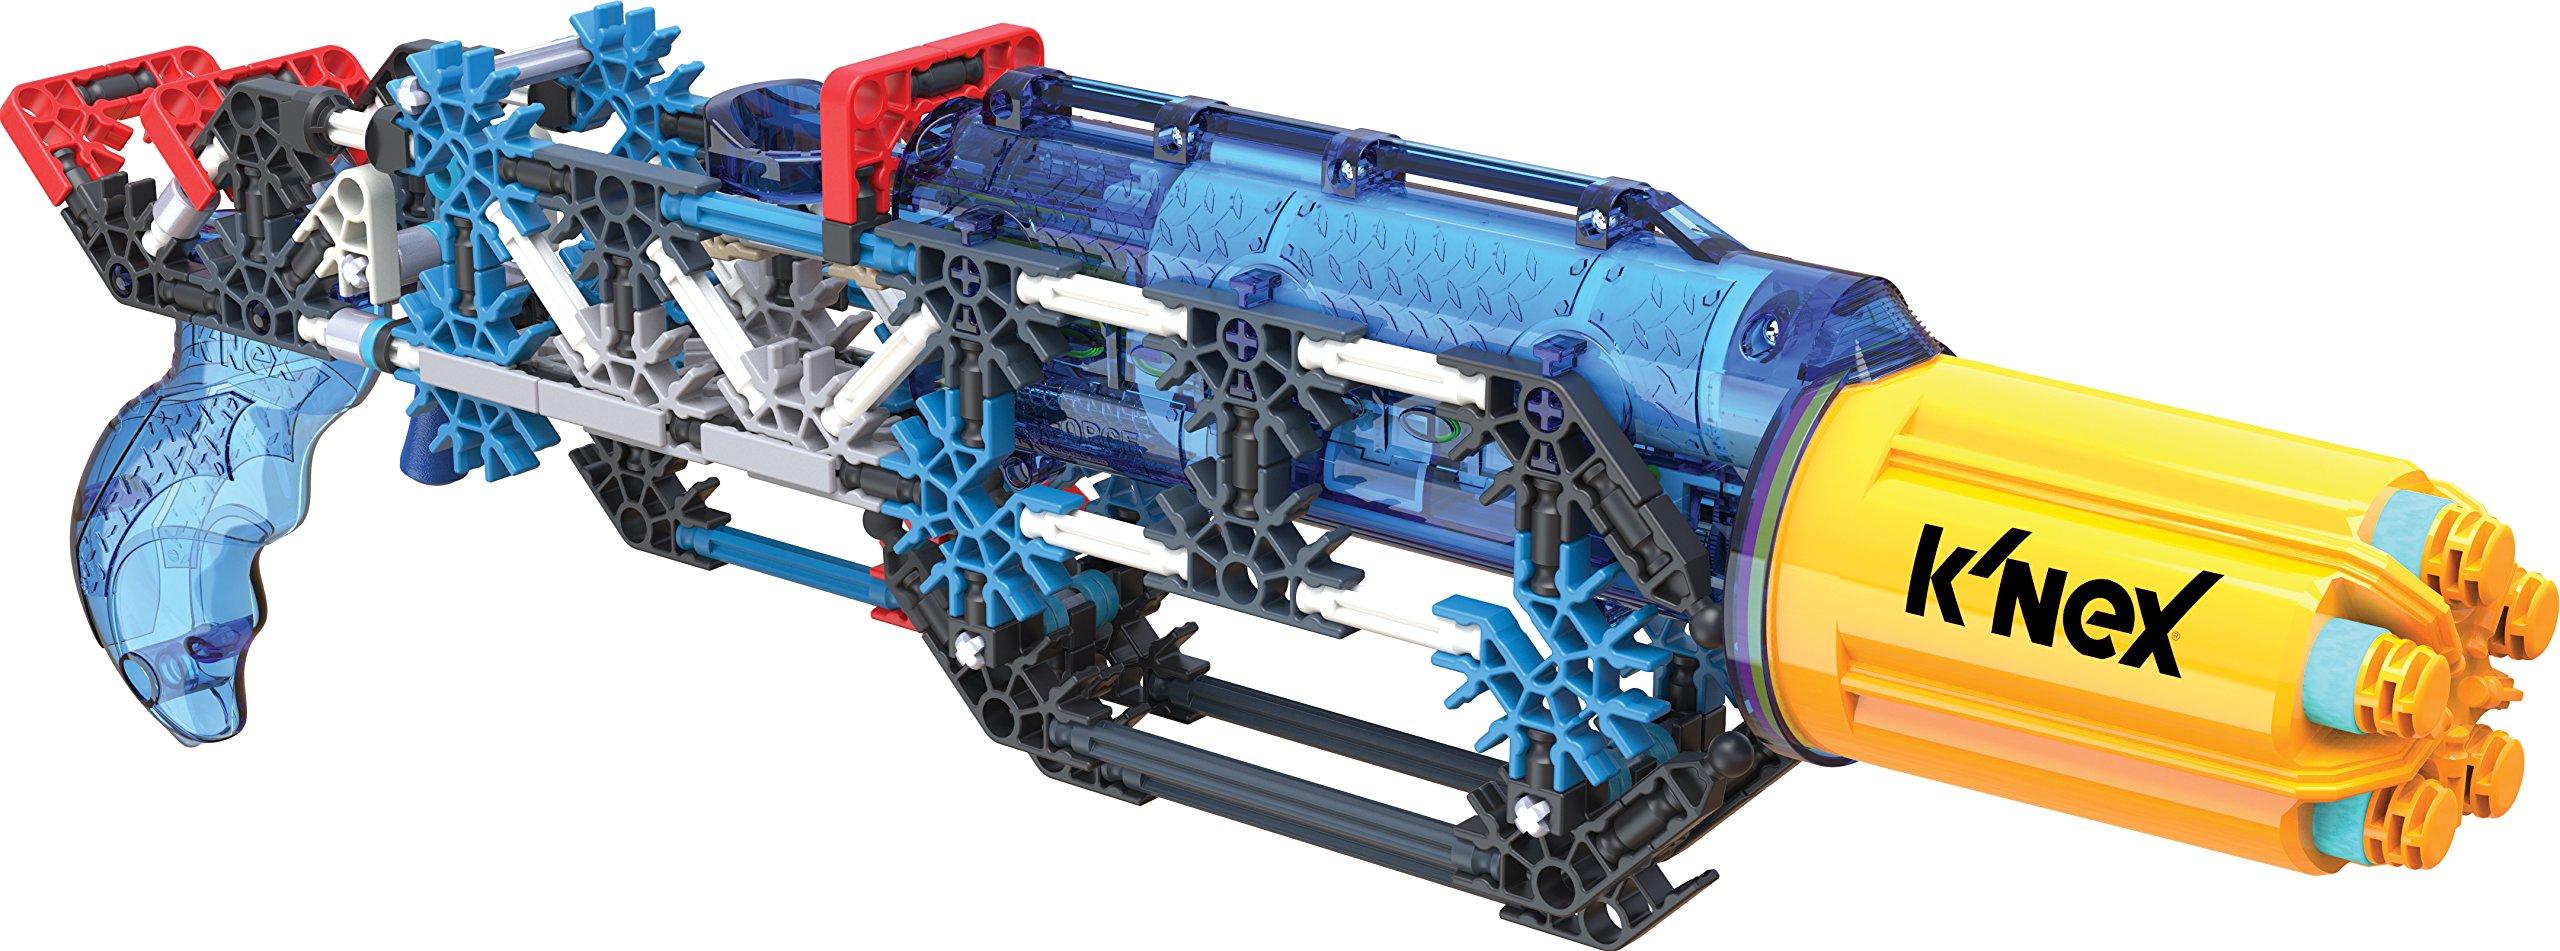 K'NEX K-FORCE K-25X RotoShot Blaster Building Set (214 Piece)